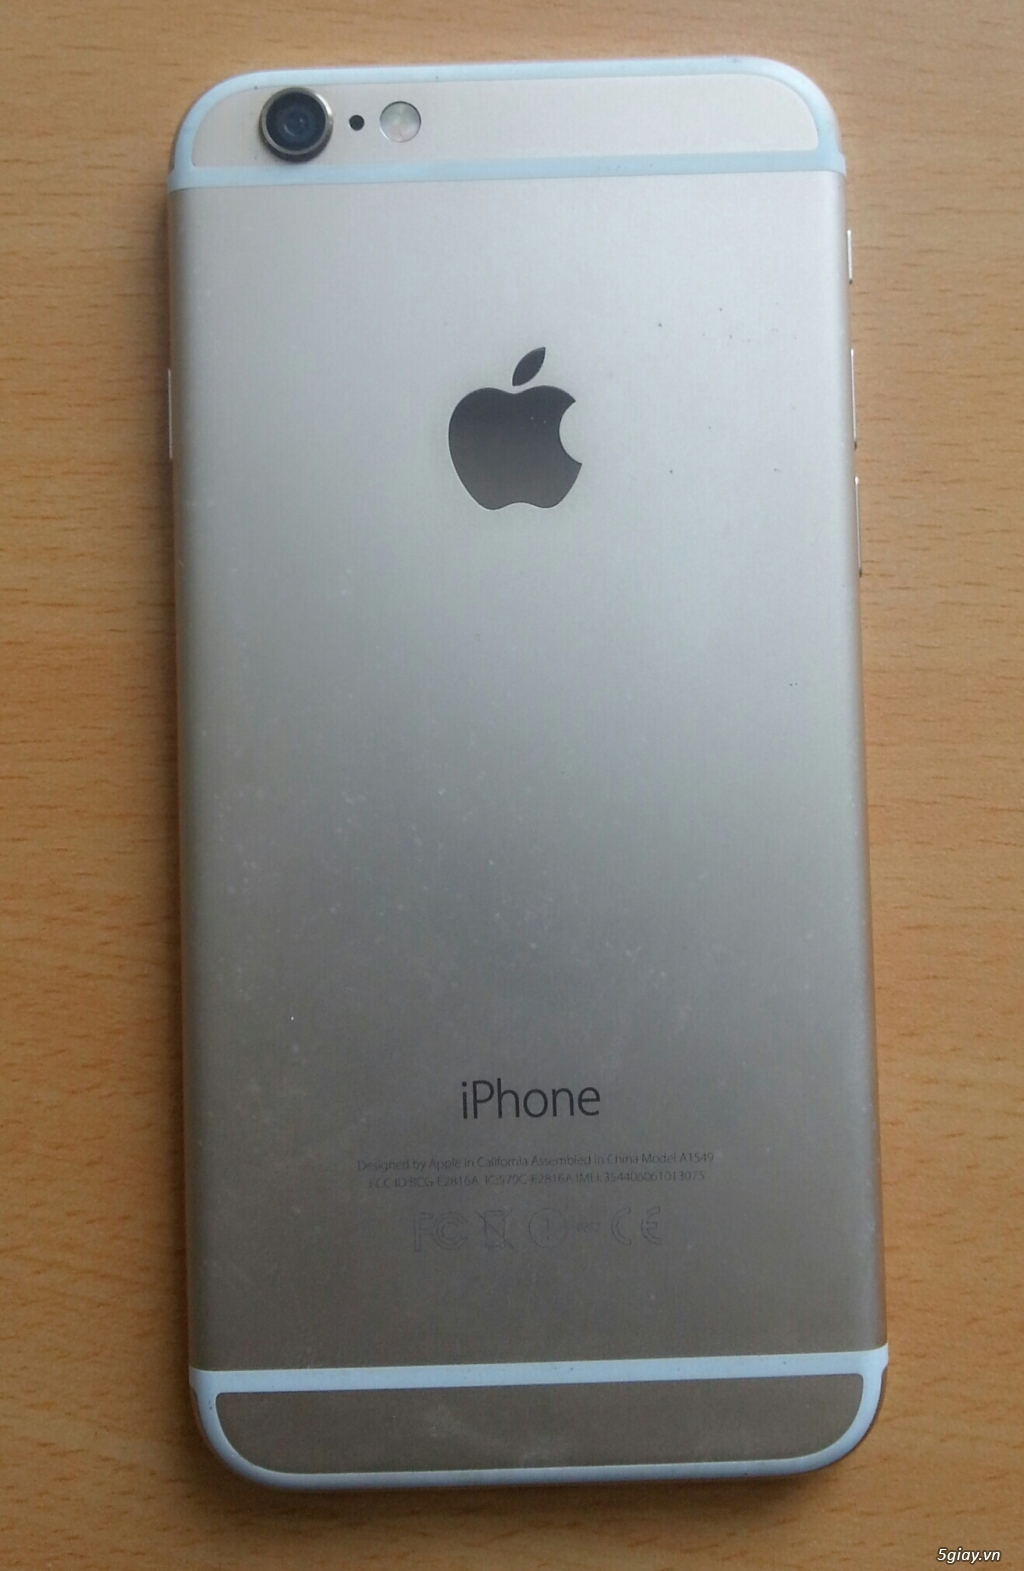 IPhone 6 Gold bản Quốc tế 16G cần bán